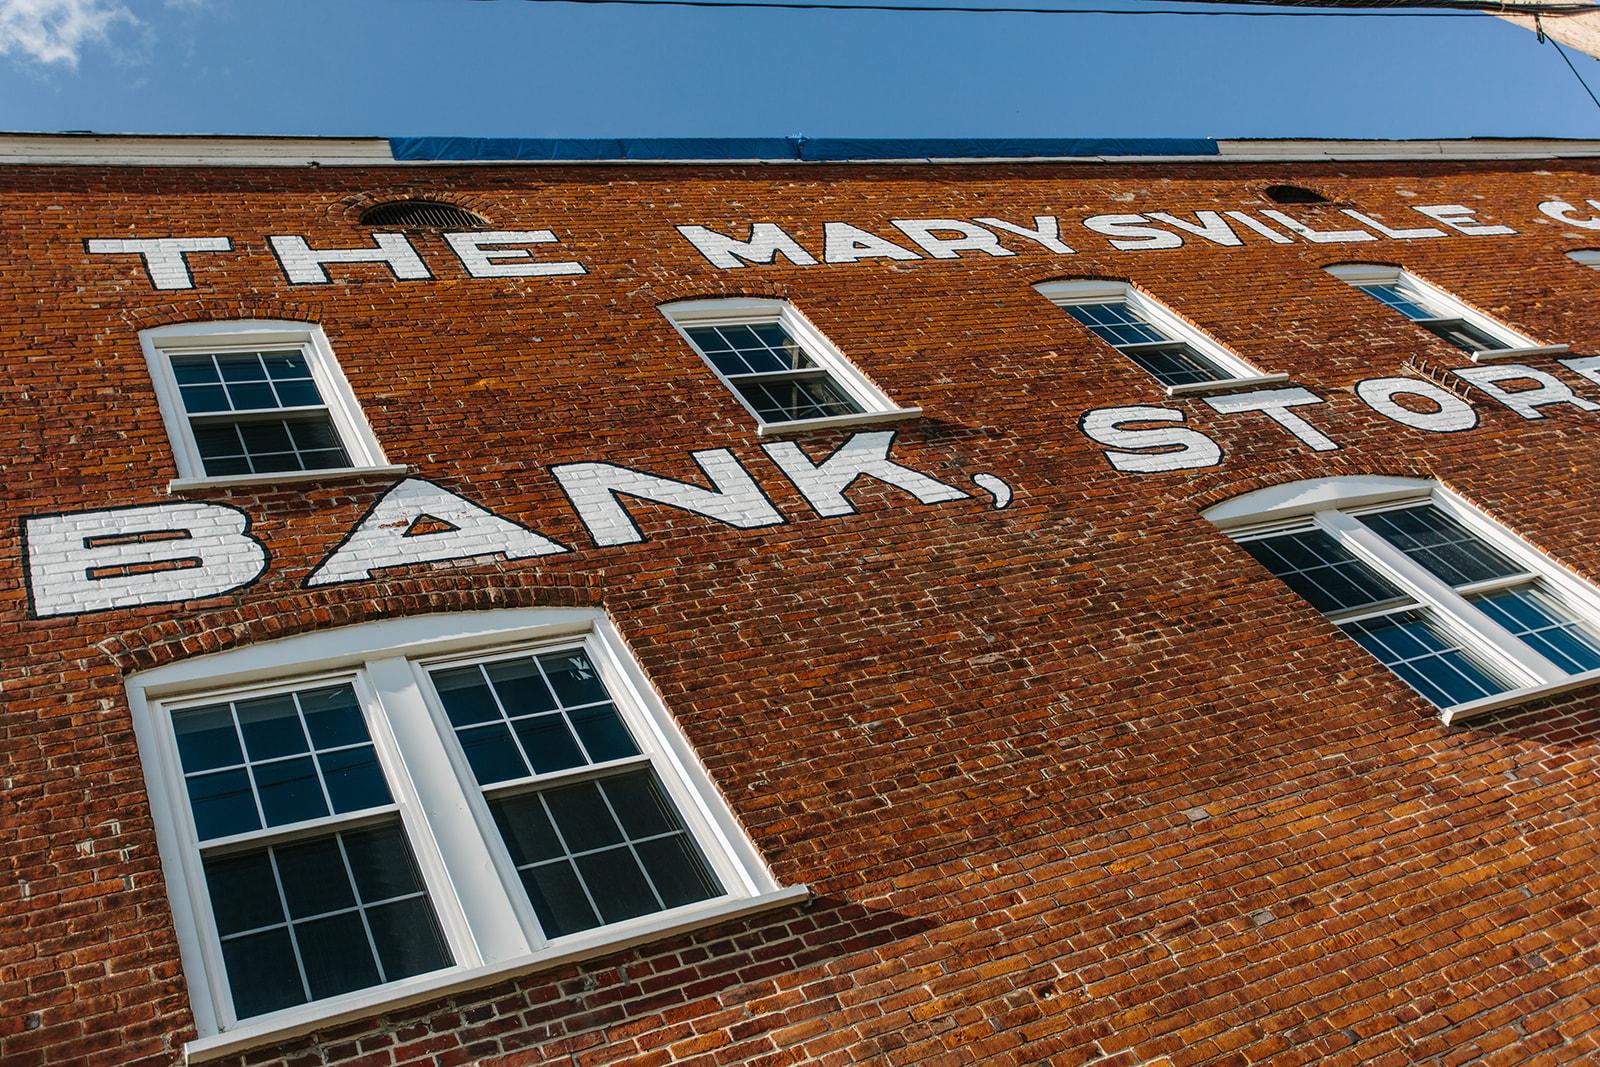 marysville-074.jpg